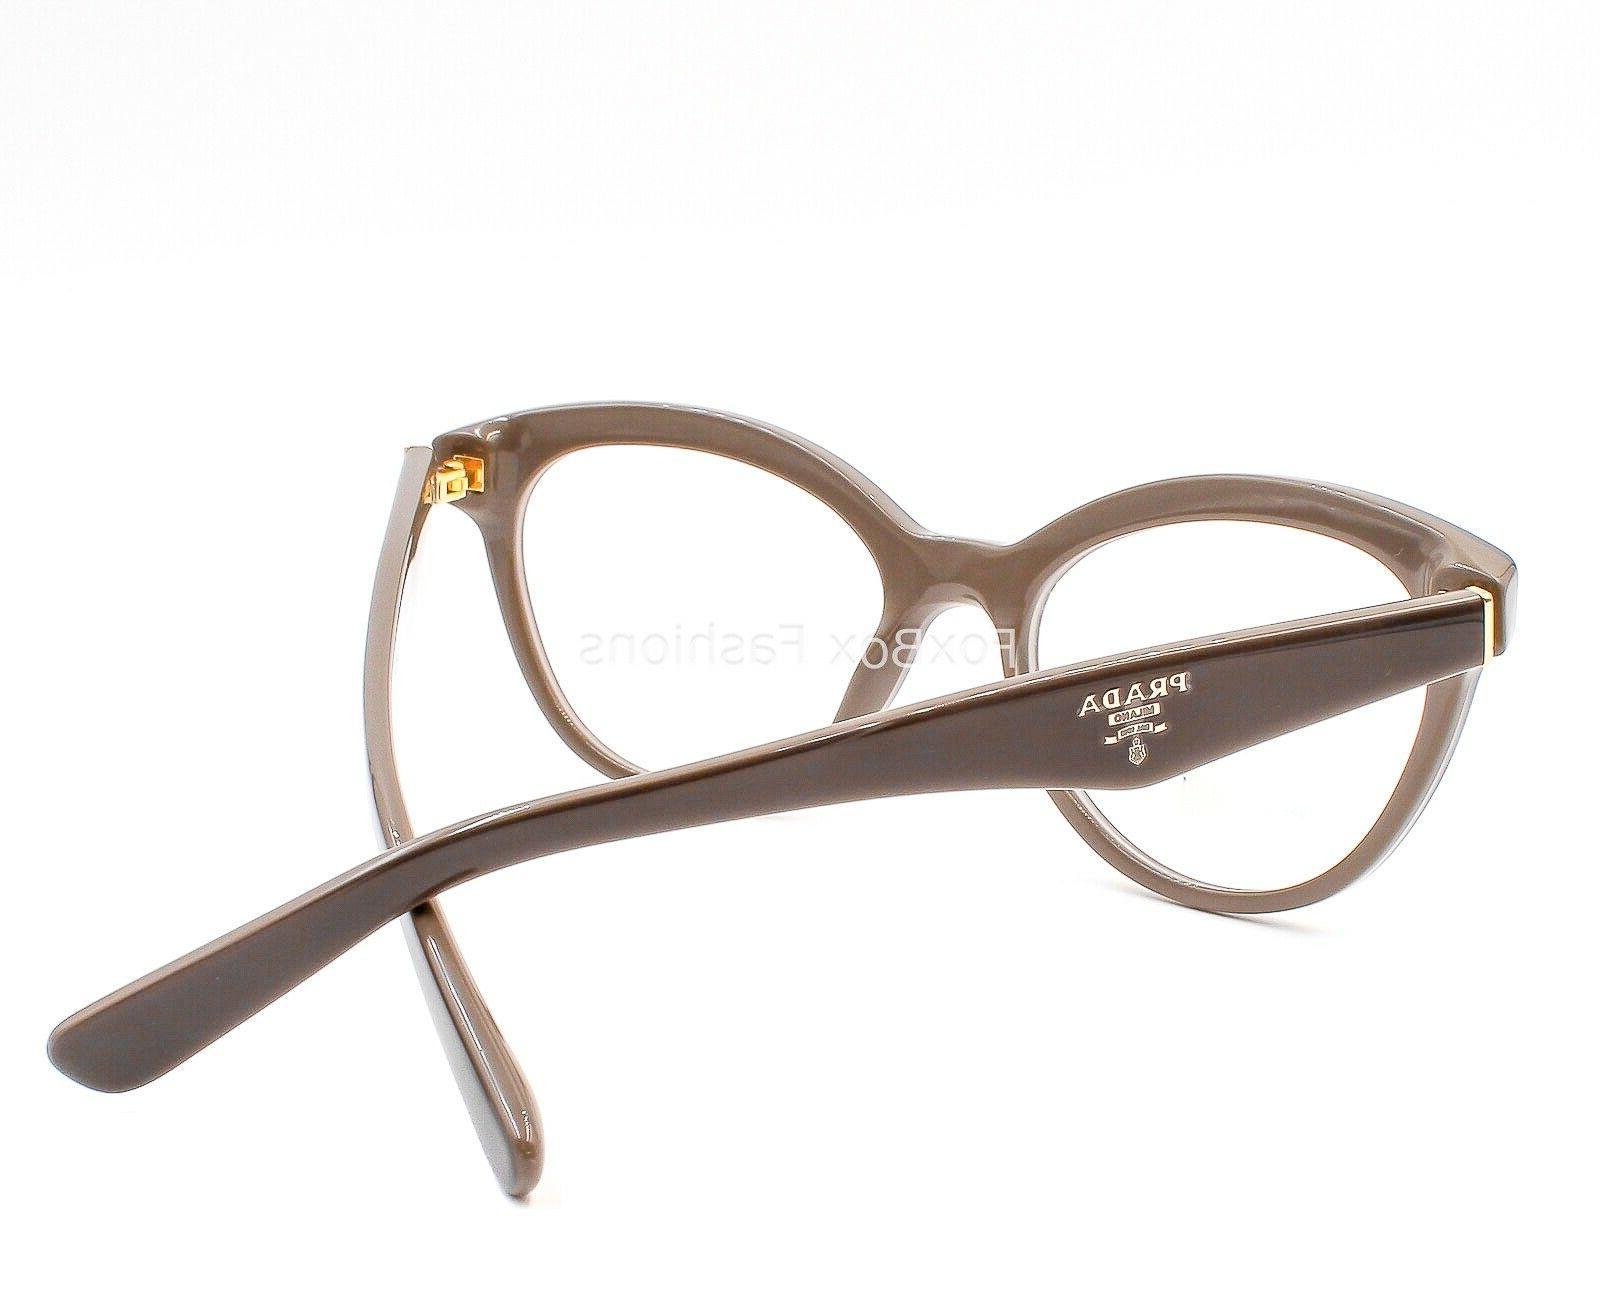 PRADA VPR Eyeglasses Frames Brown on